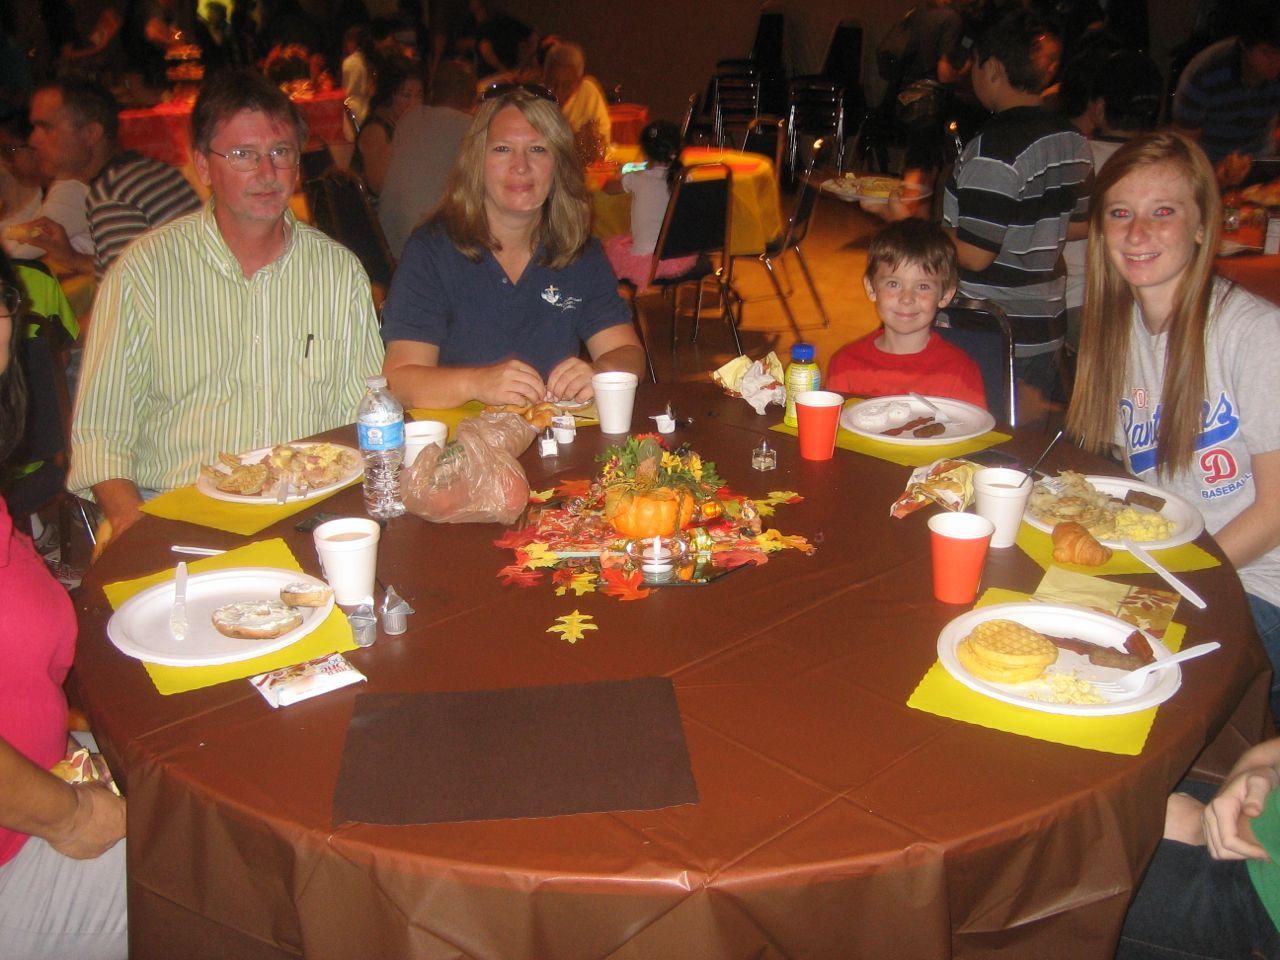 MIke Moloughney and familiy enjoying breakfast